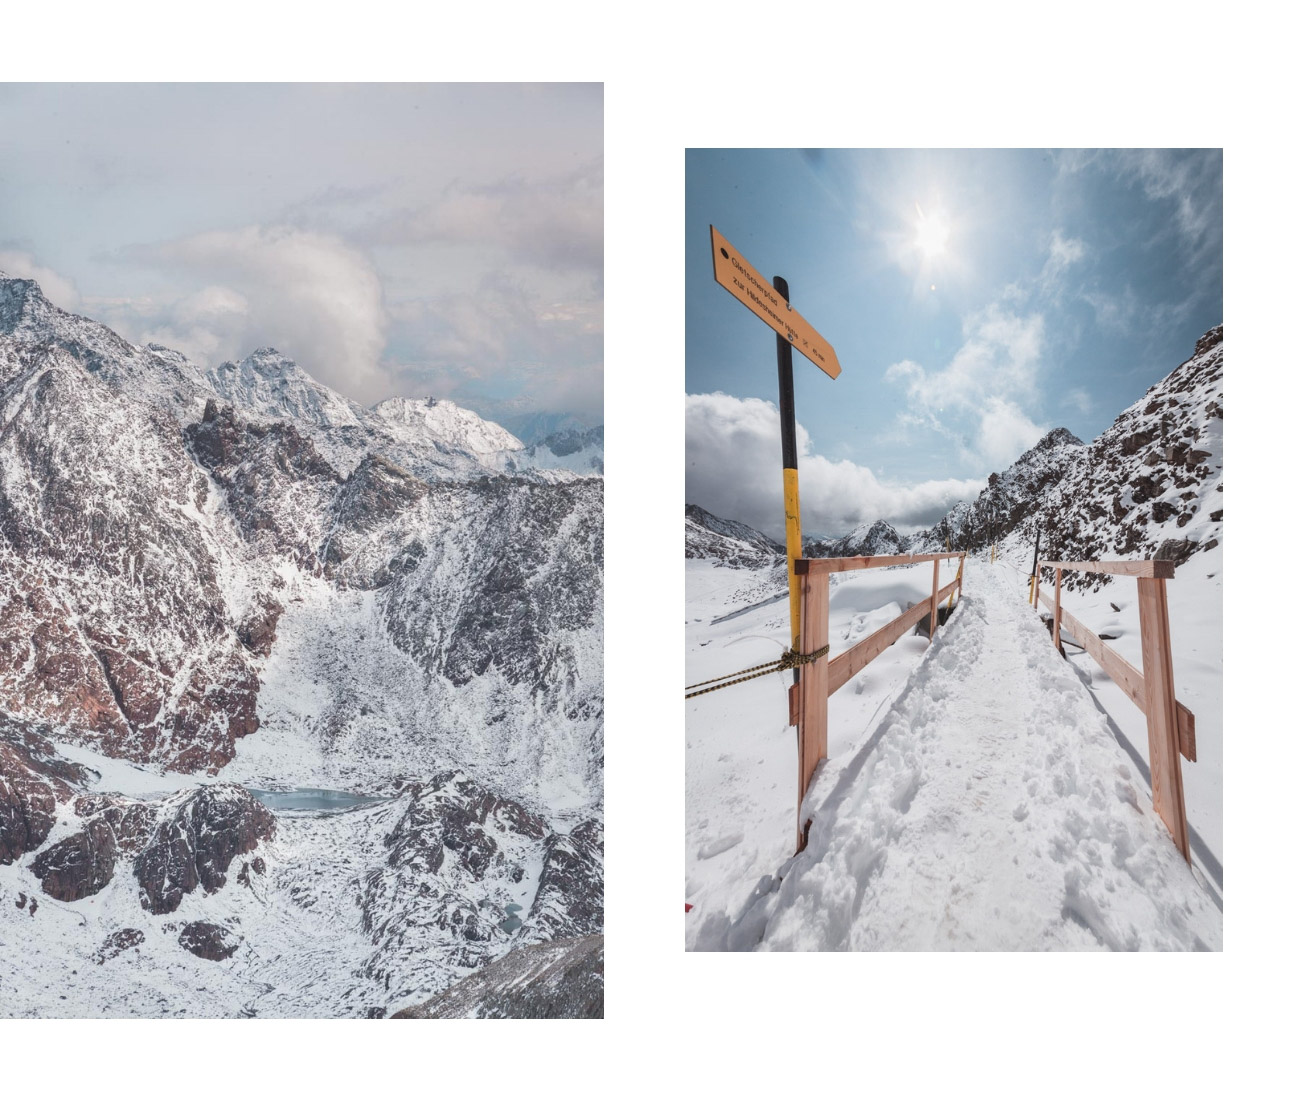 Top of Tirol Stubai